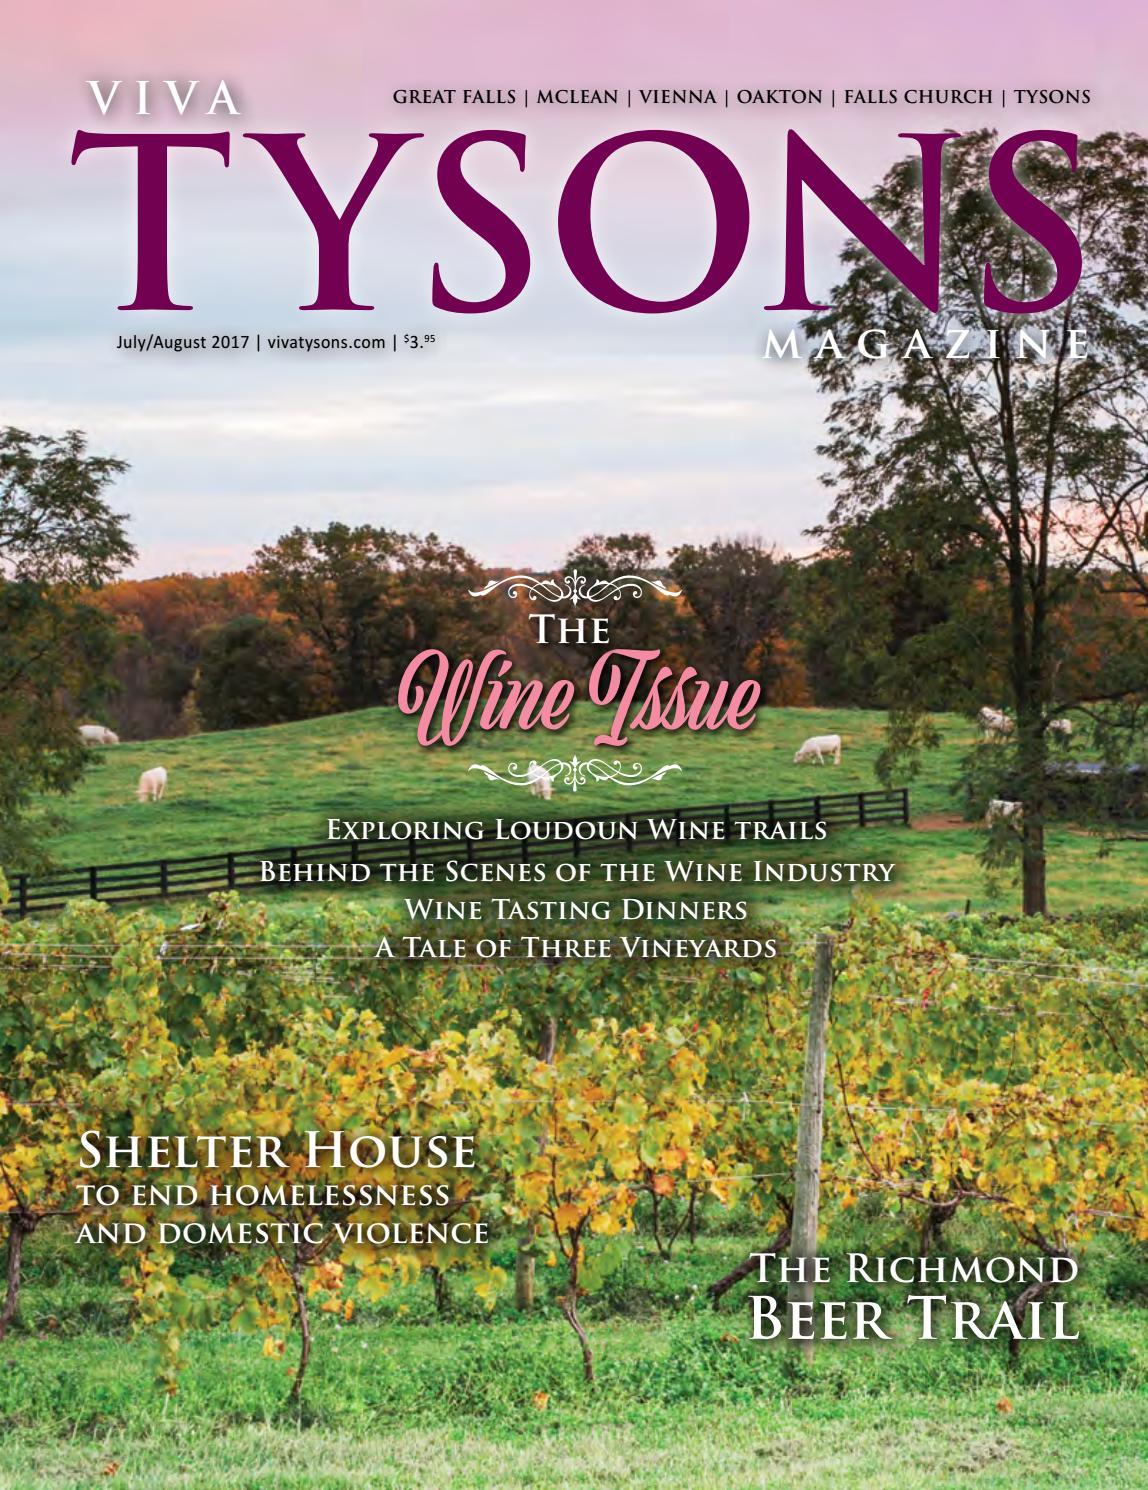 VivaTysons Magazine | July-August 2017 by Johnny Hanna - issuu